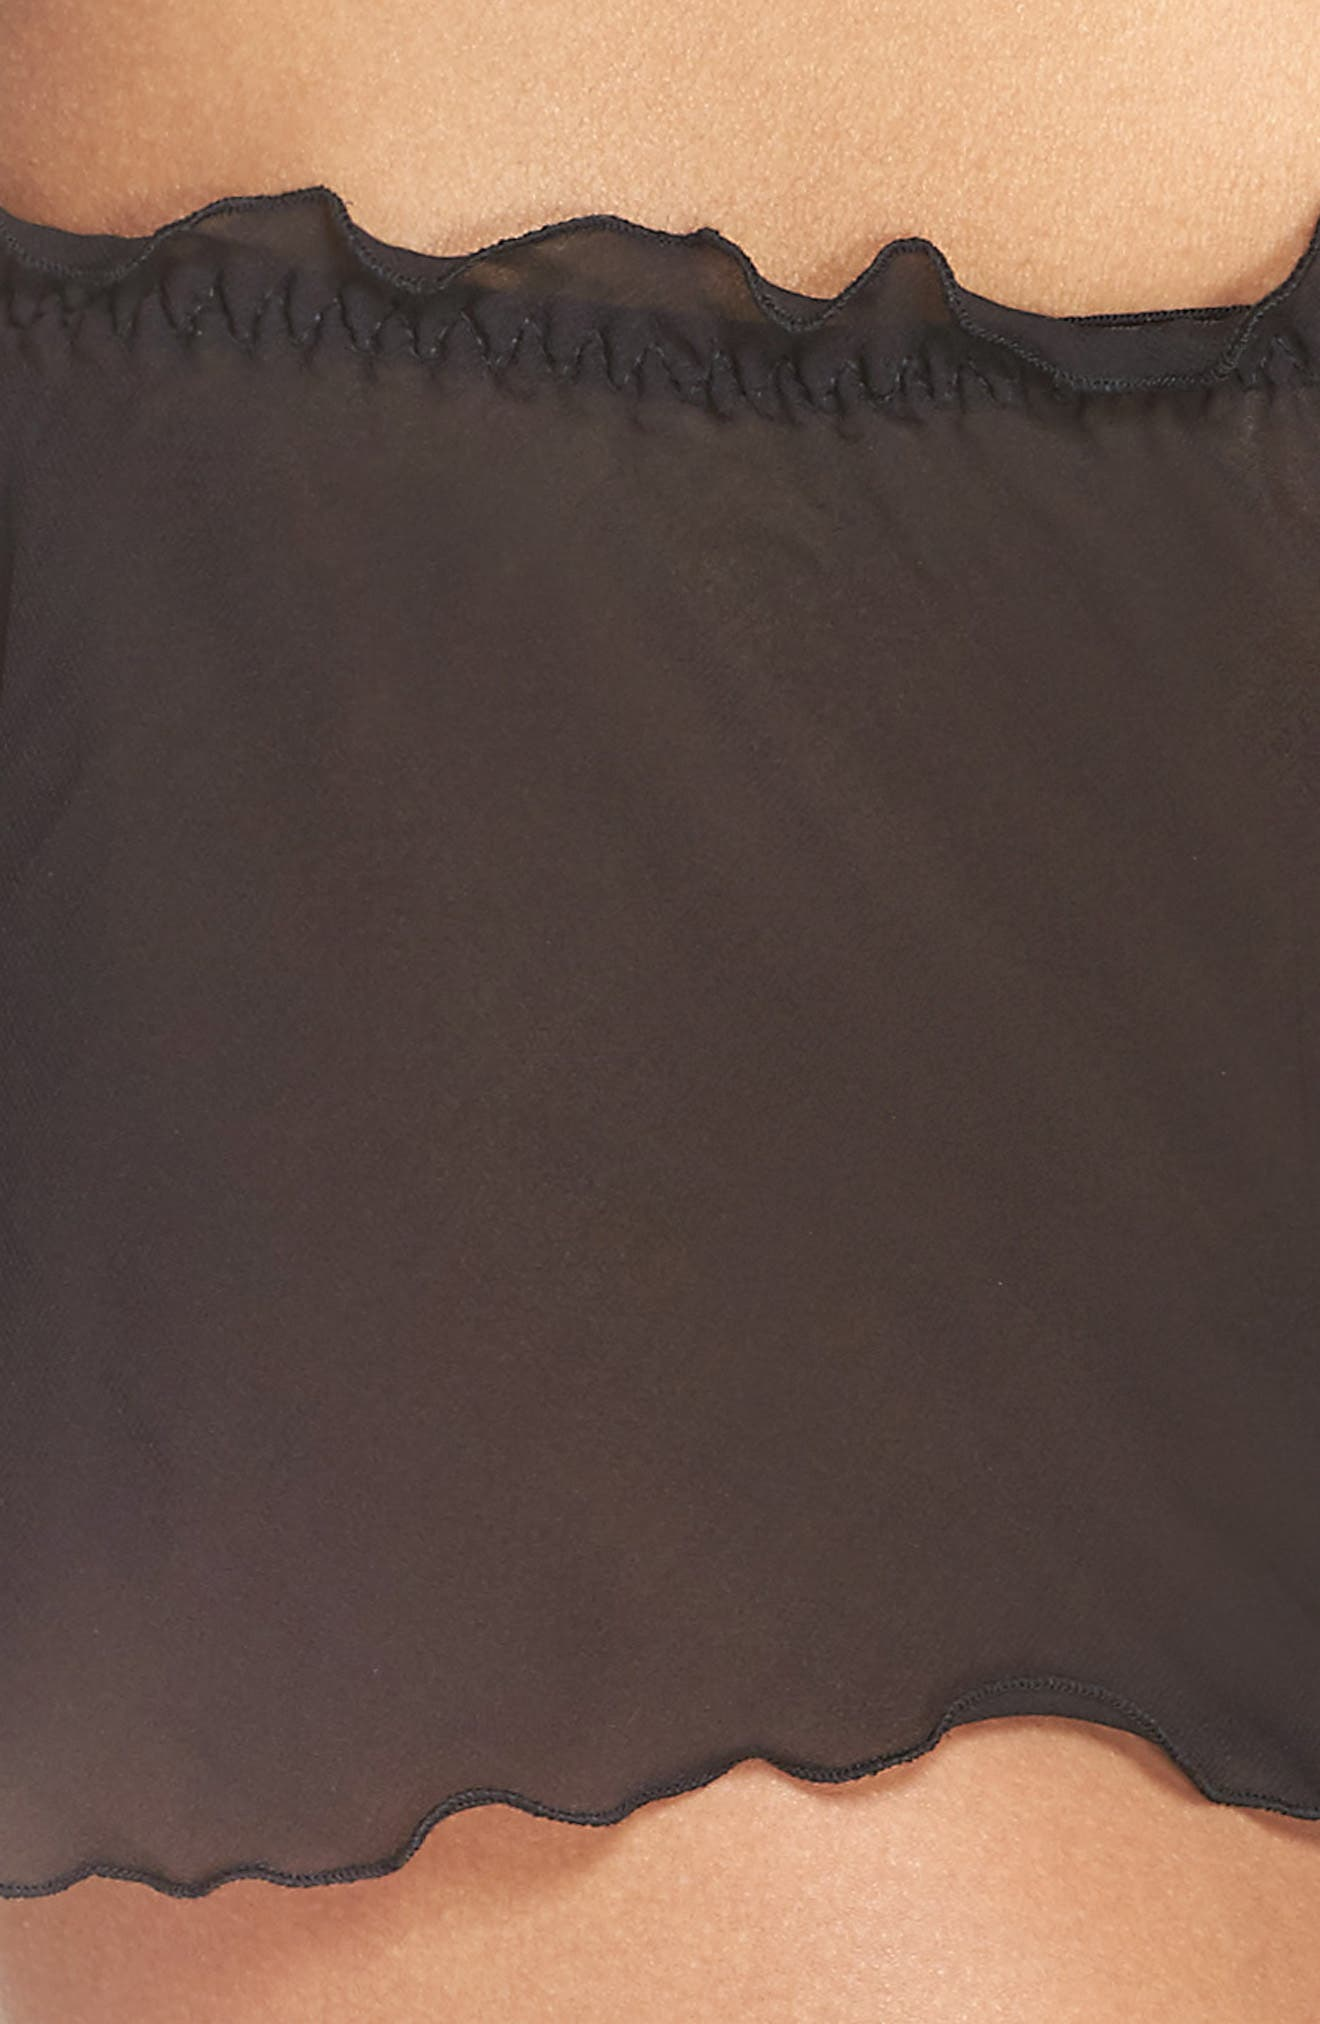 Chiffon Tap Shorts,                             Alternate thumbnail 4, color,                             001